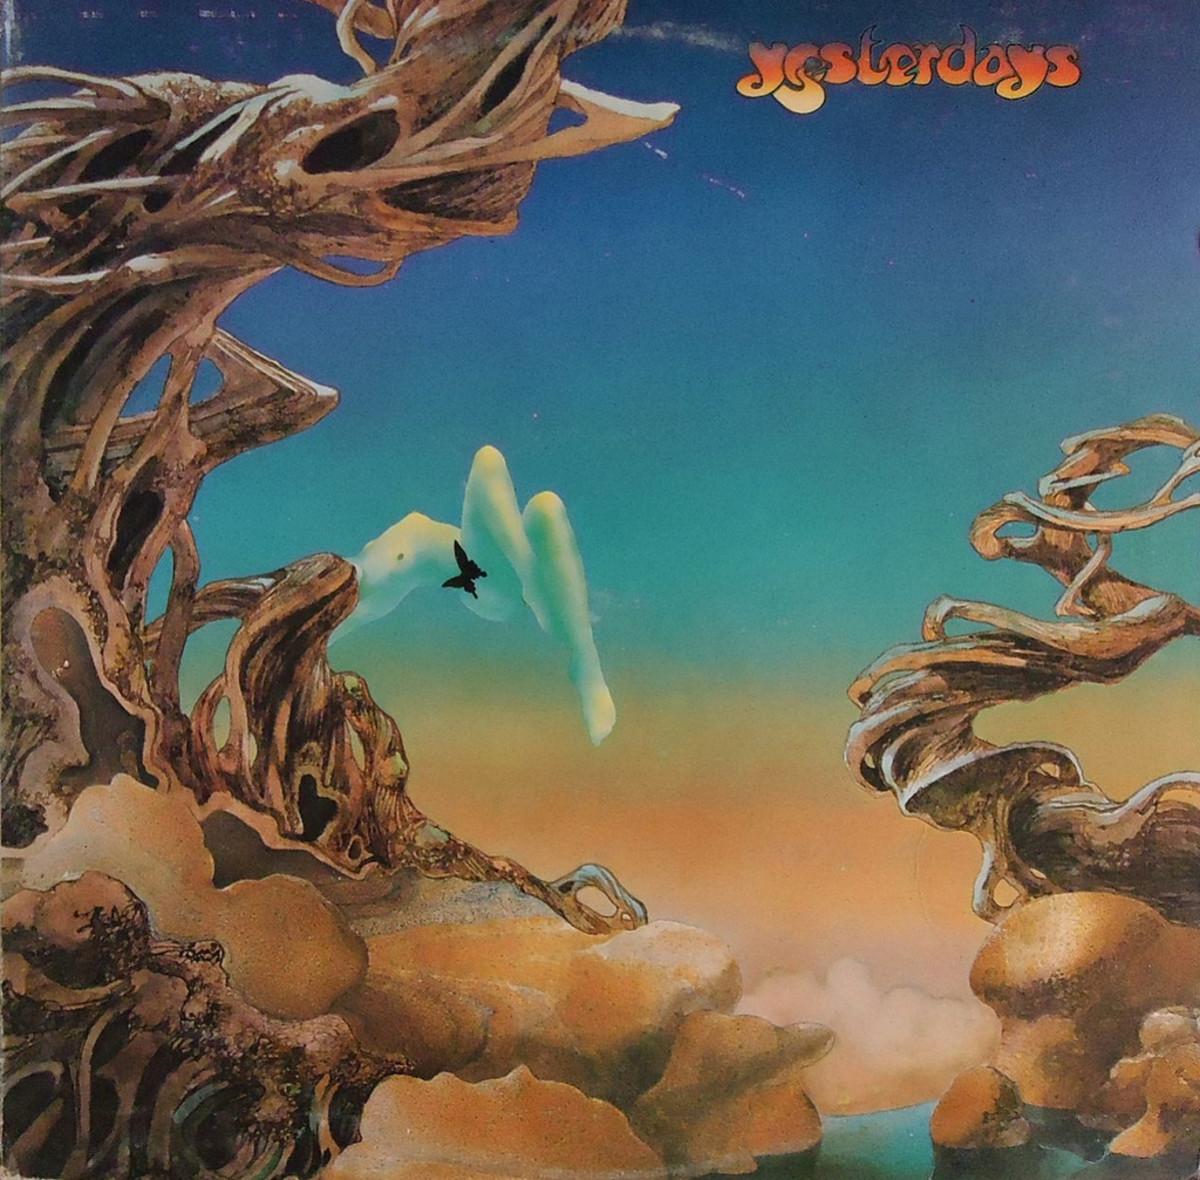 "Yes ""Yesterdays"" Atlantic Records SD 18103 12"" LP Vinyl Record, US Pressing (1975) Gatefold Album Cover Art & Design by Roger Dean"